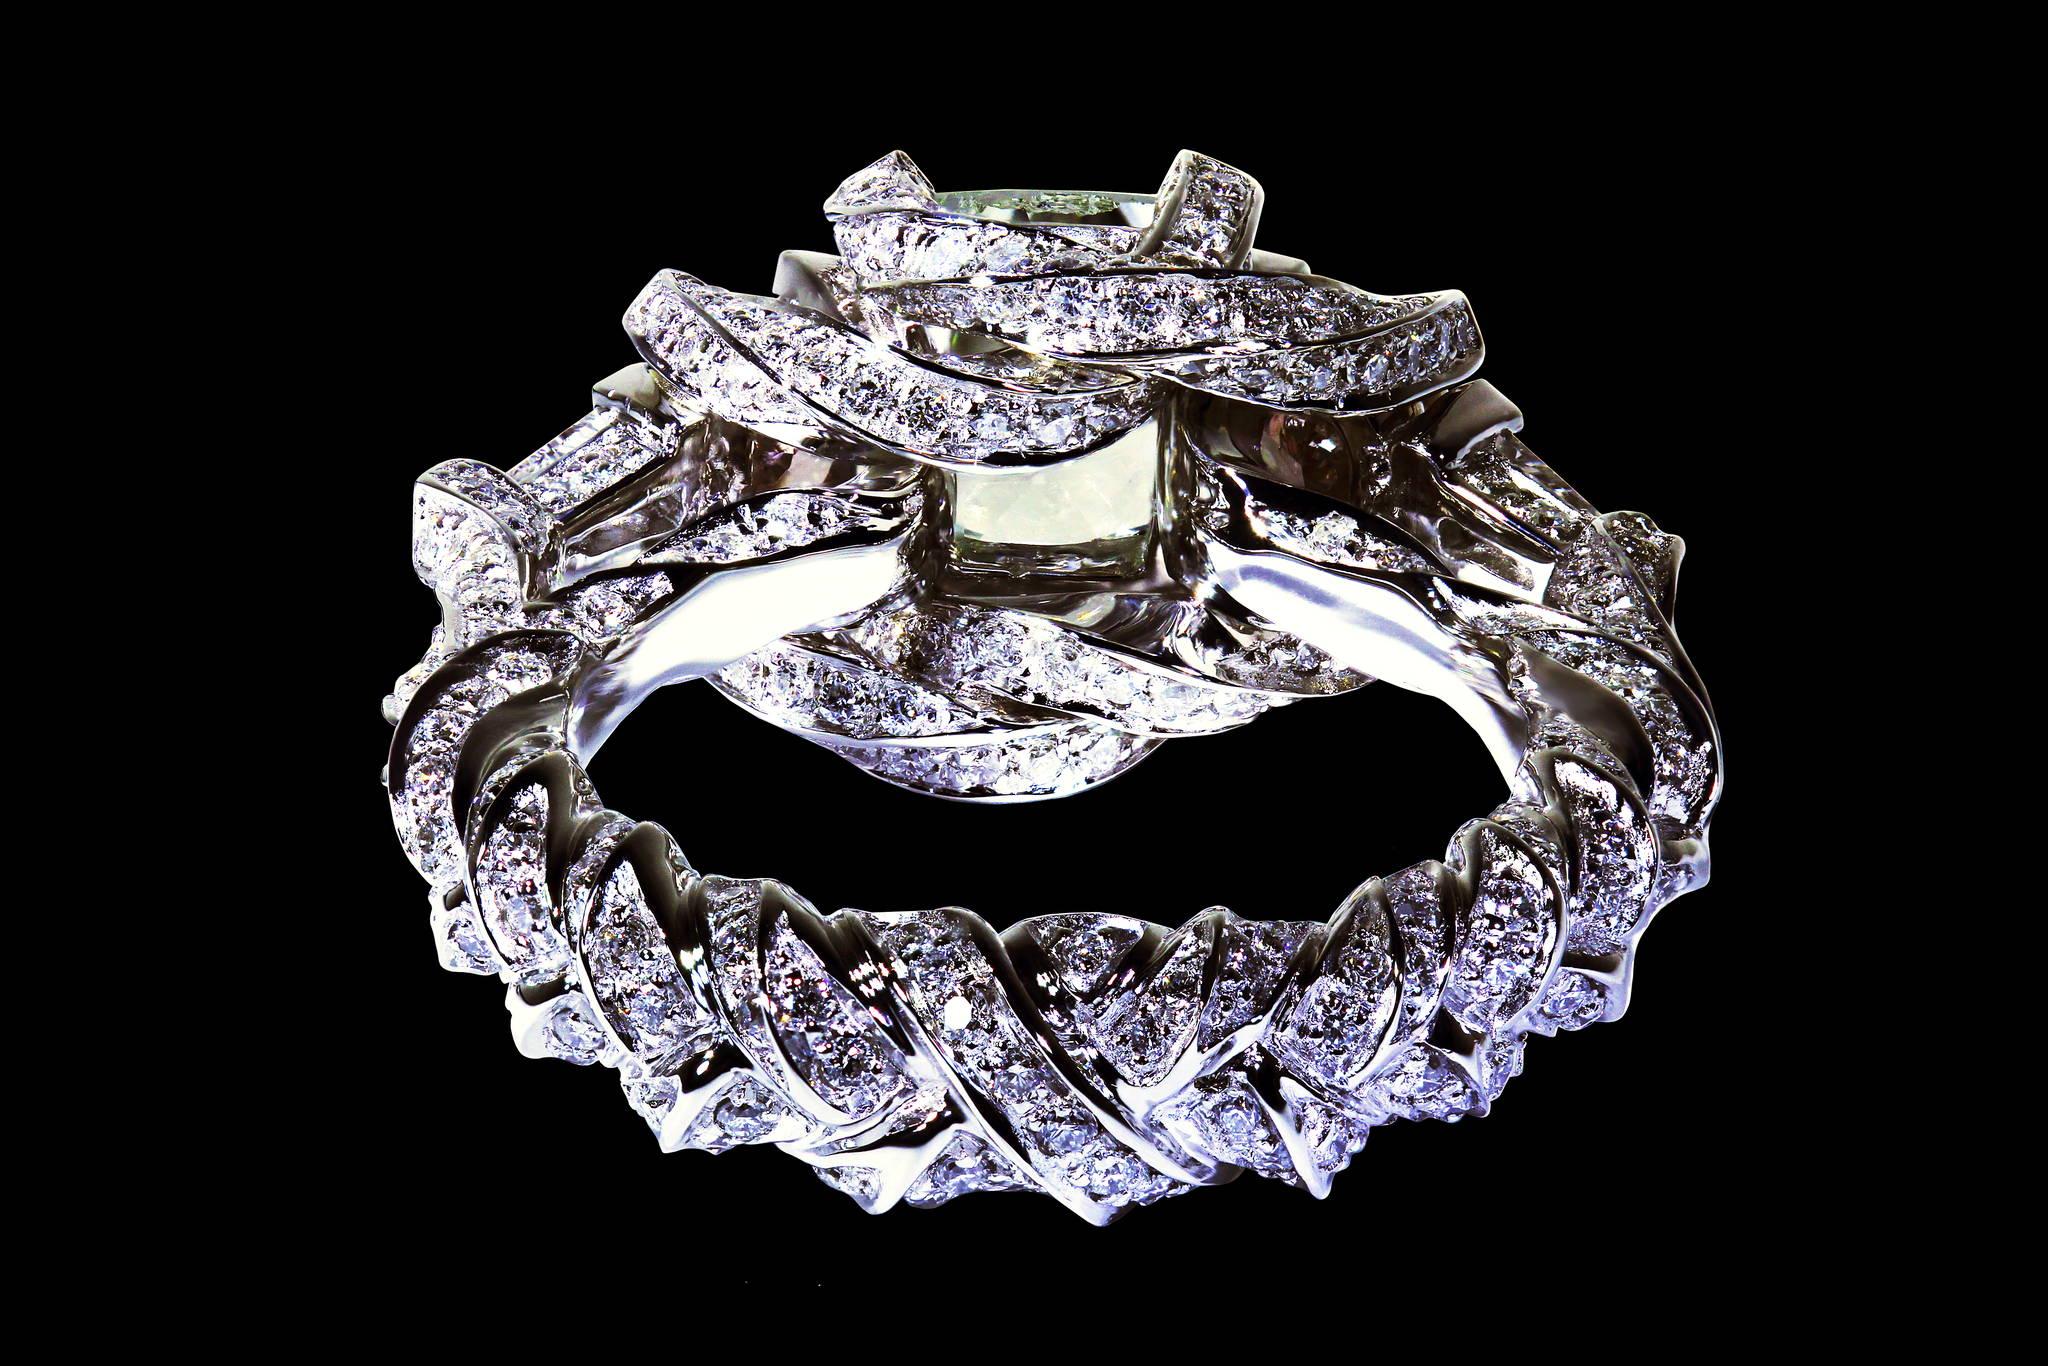 Braided Shank Diamond Ring back view